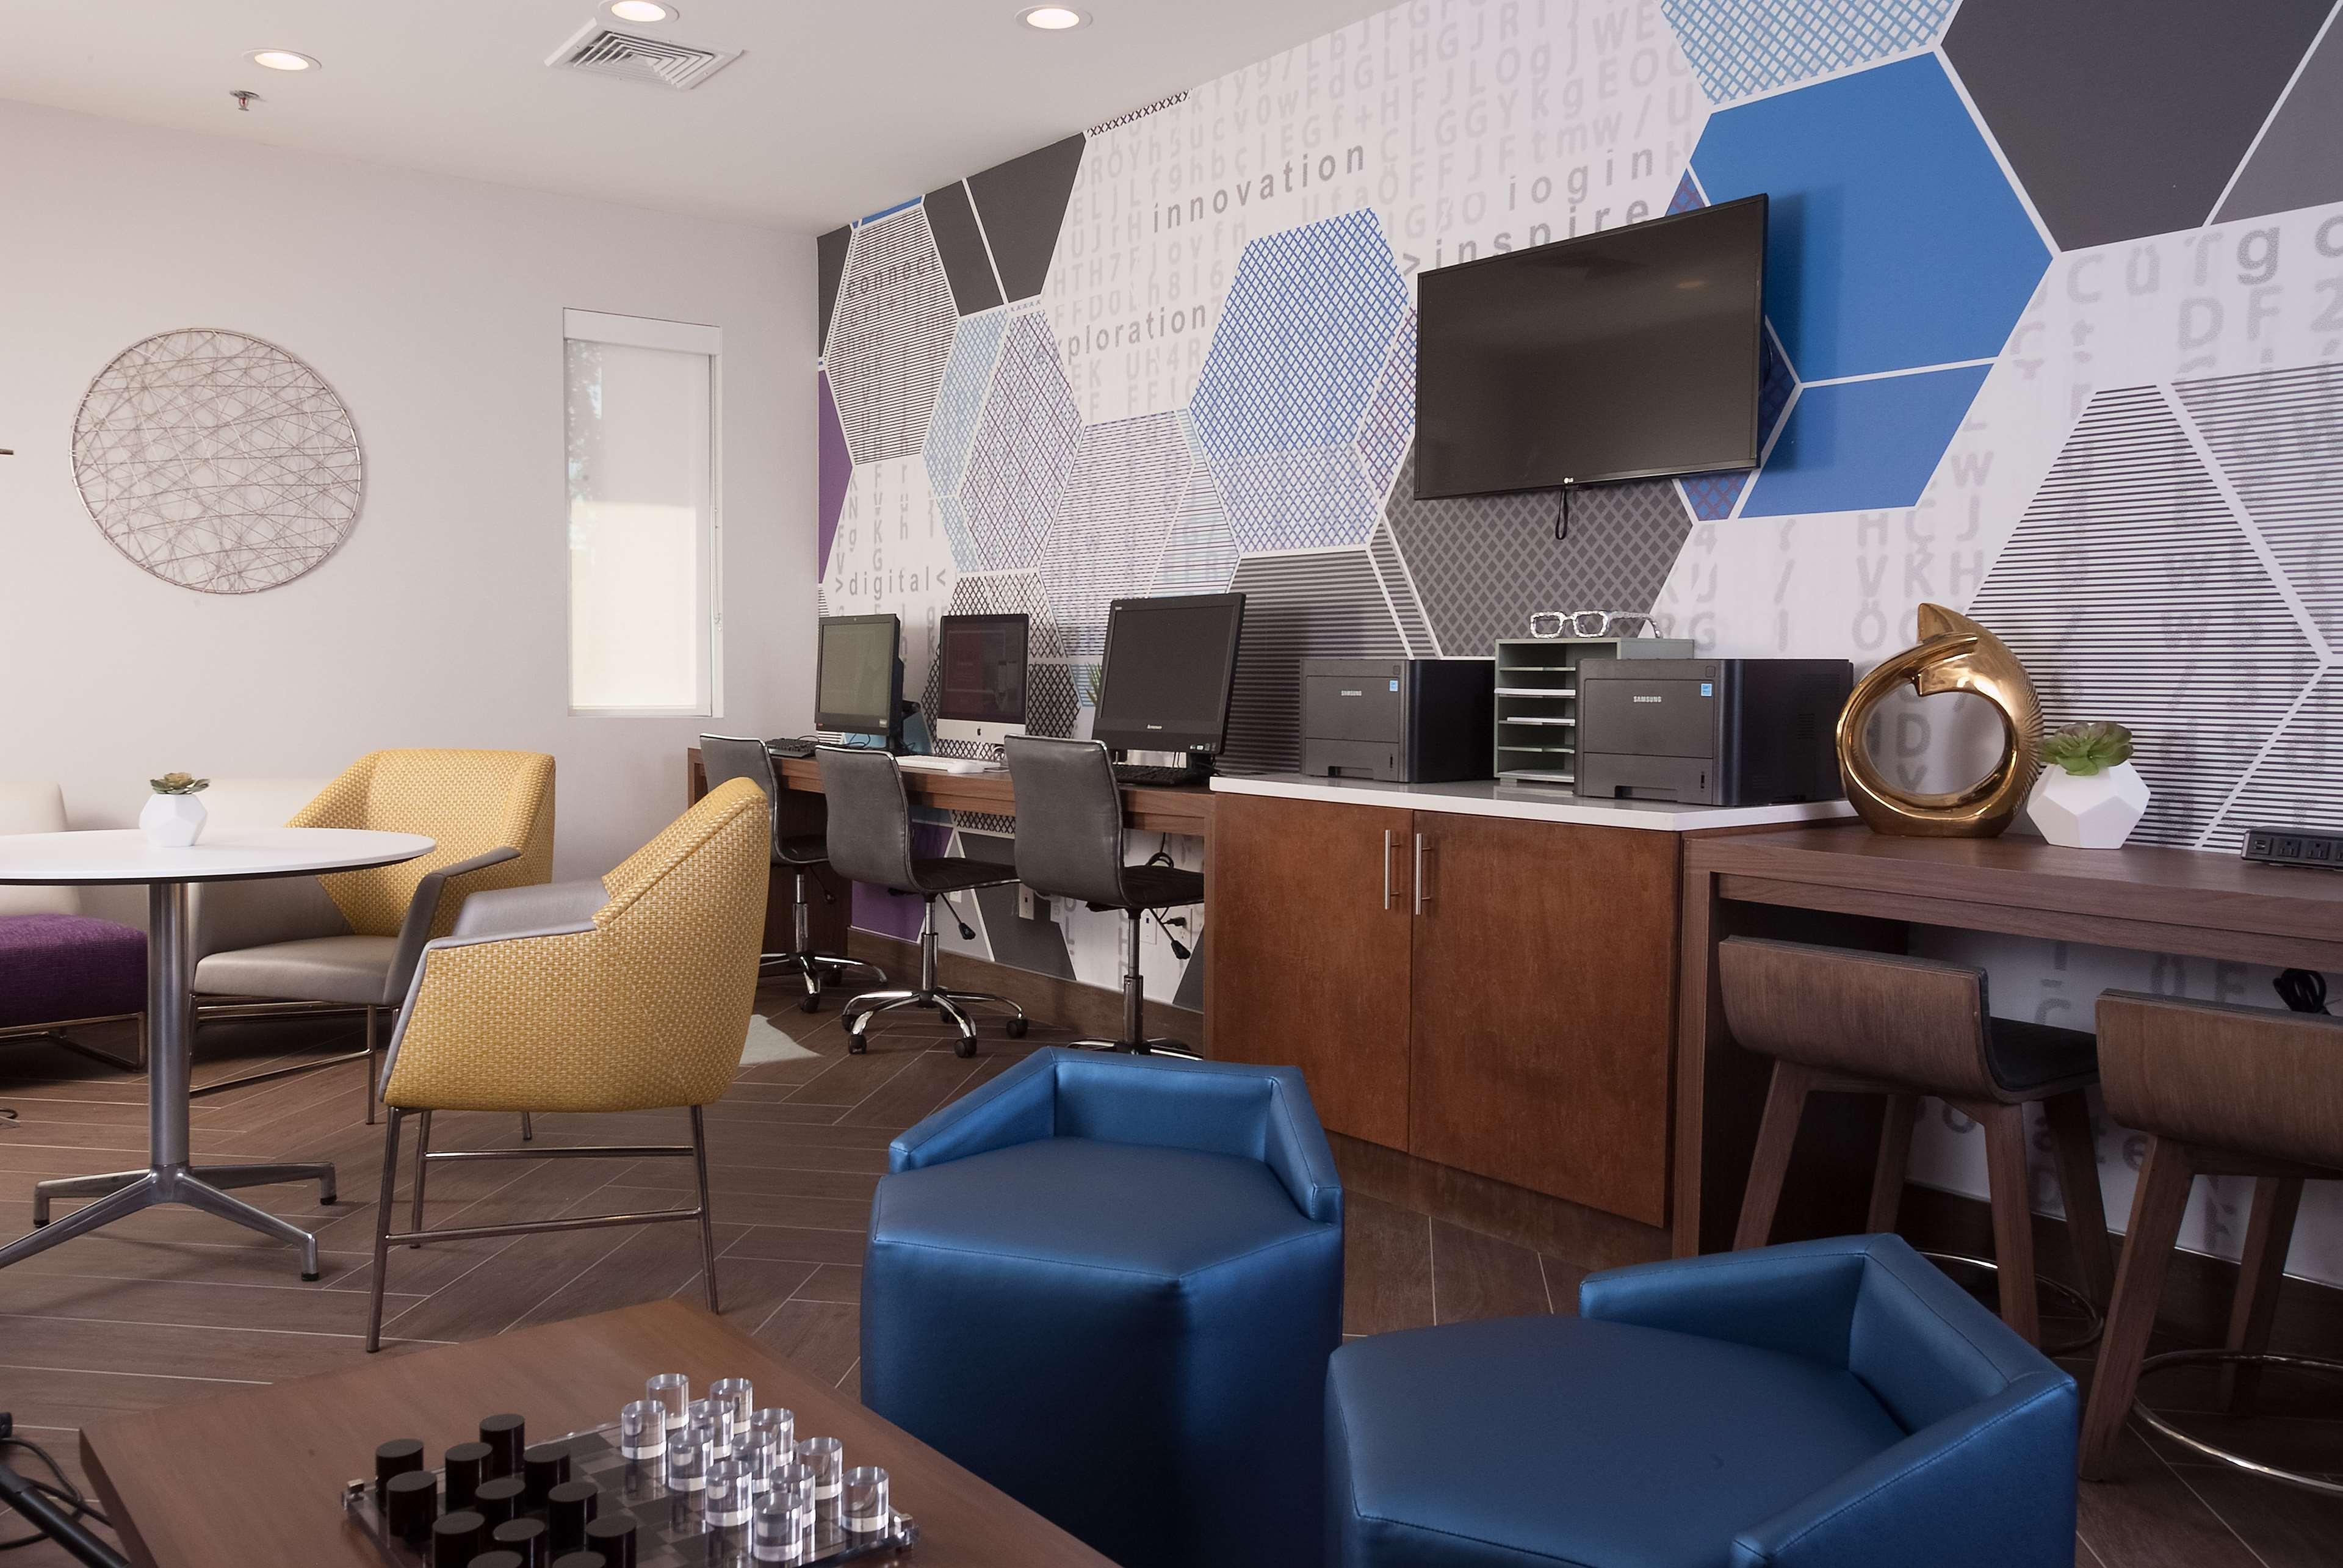 Home2 Suites By Hilton Atlanta Perimeter Center In Atlanta